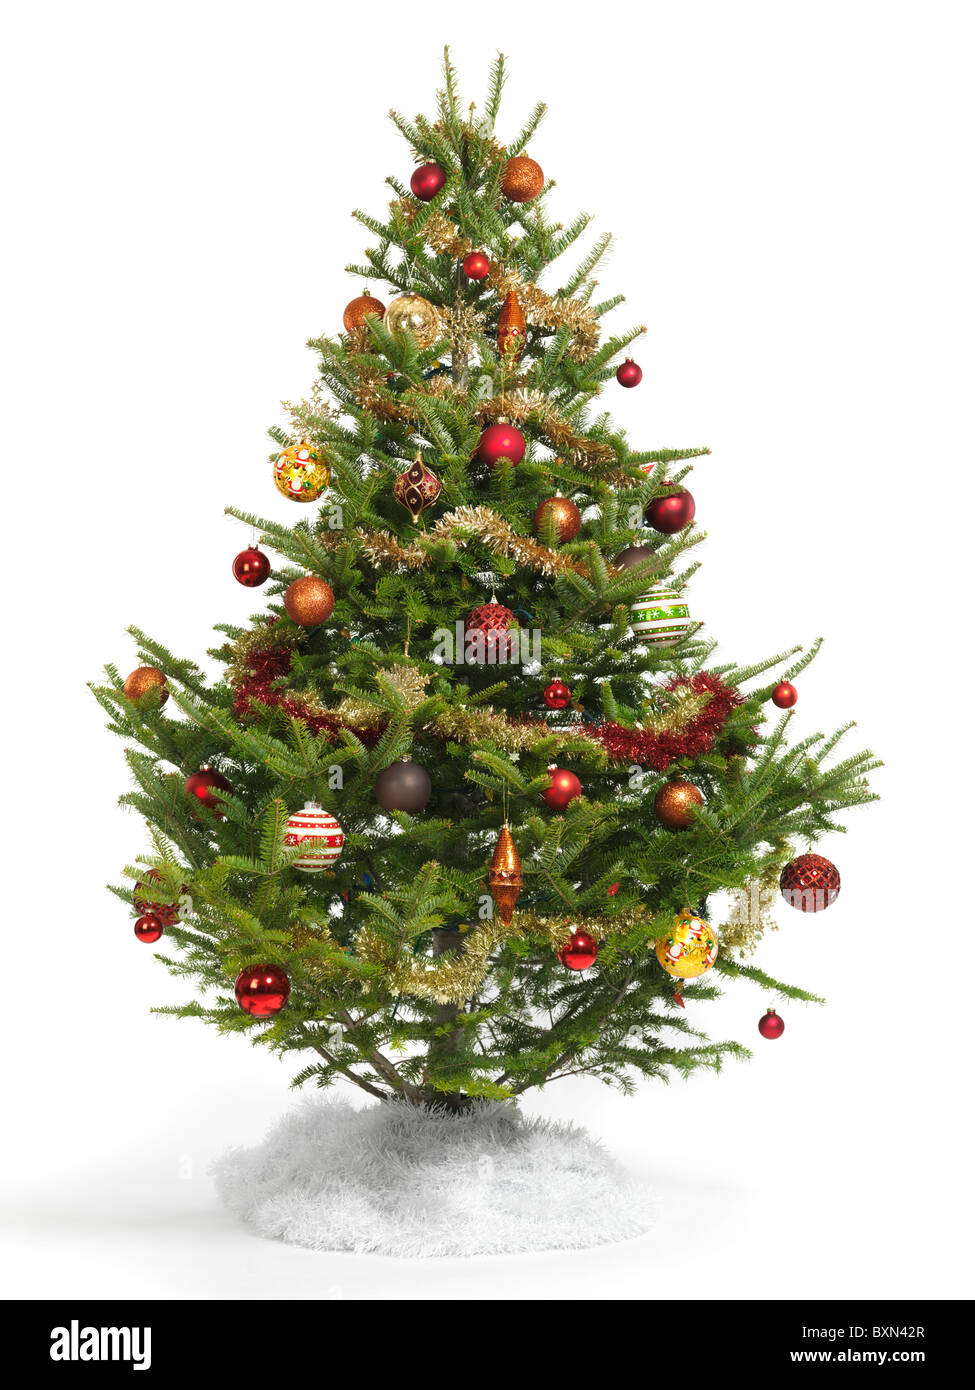 Decorated Christmas tree isolated on white background Stock Photo